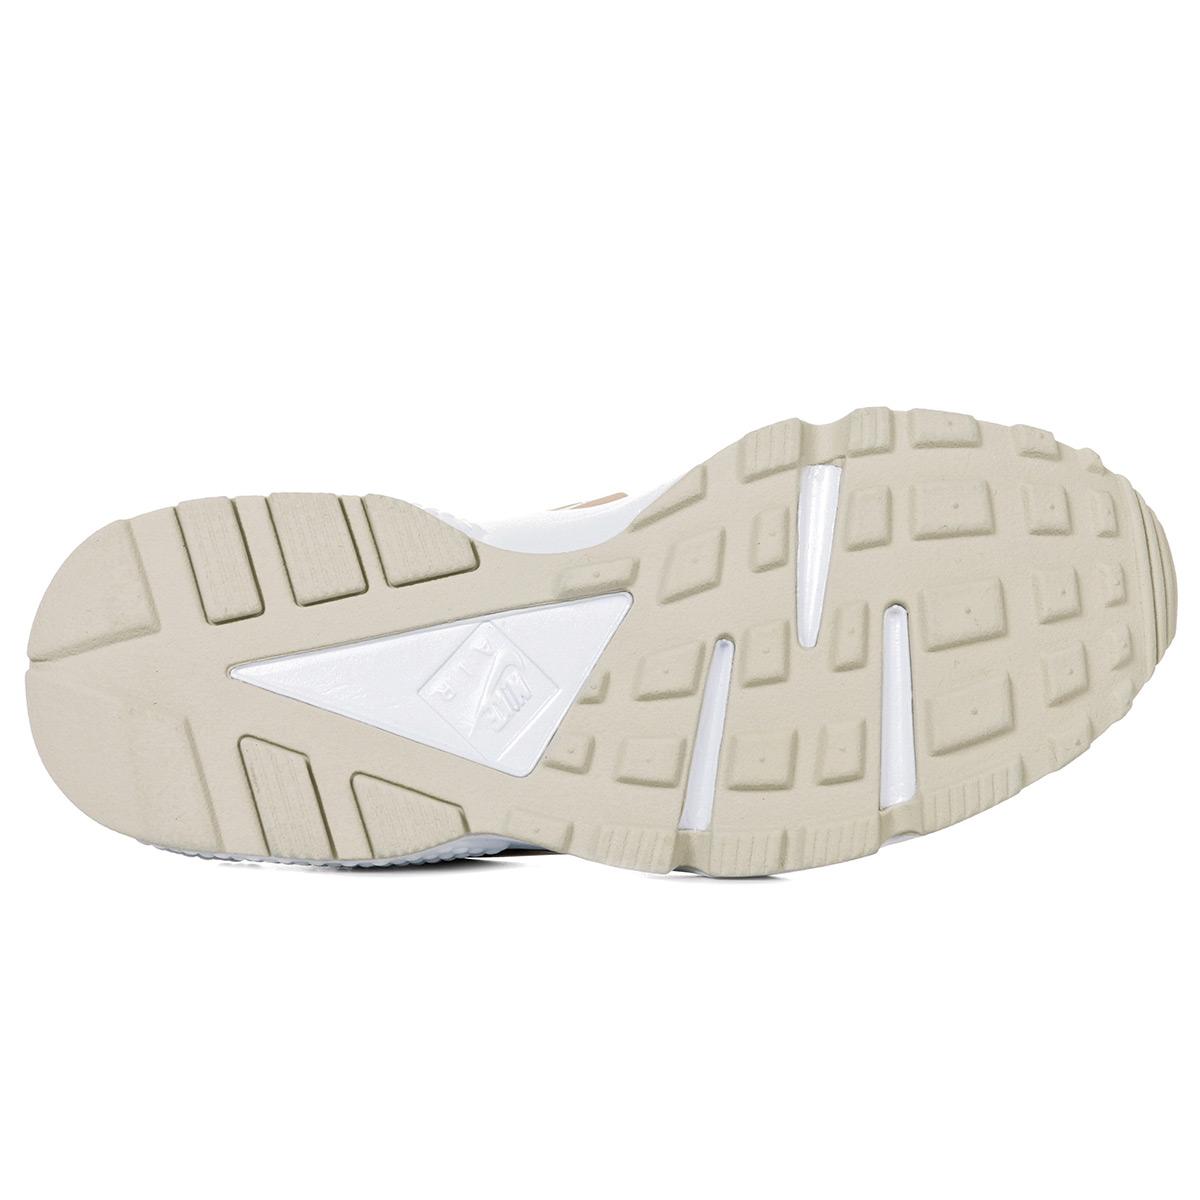 Chaussures-Baskets-Nike-femme-Wn-039-s-Air-Huarache-Run-034-Desert-Sand-034-taille-Beige miniature 6